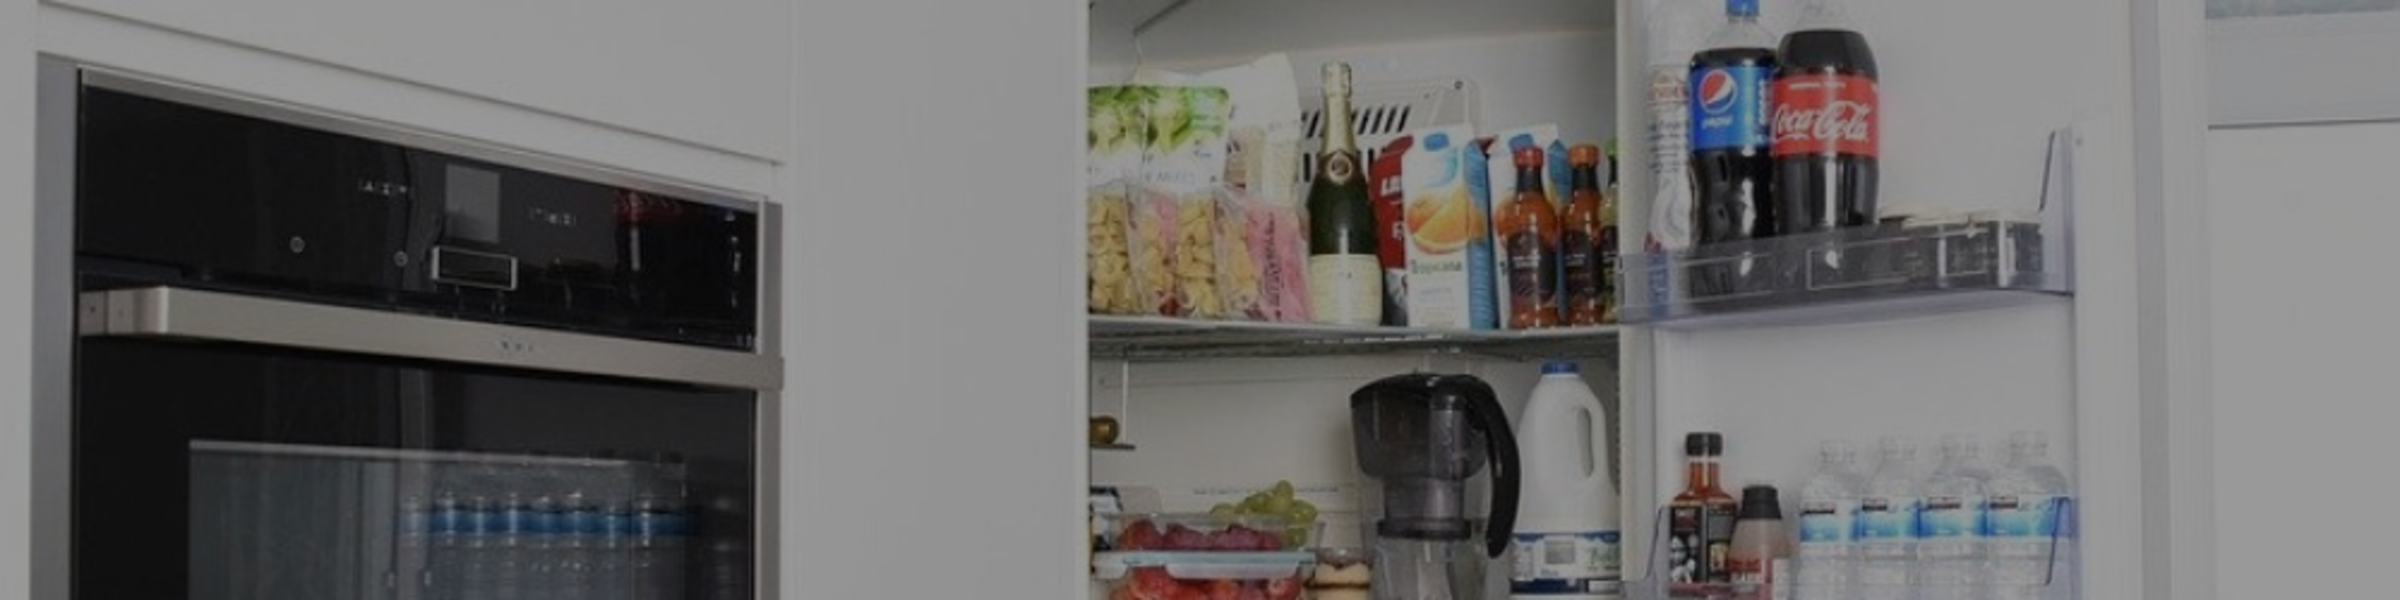 refrigerator repair pros in Johannesburg